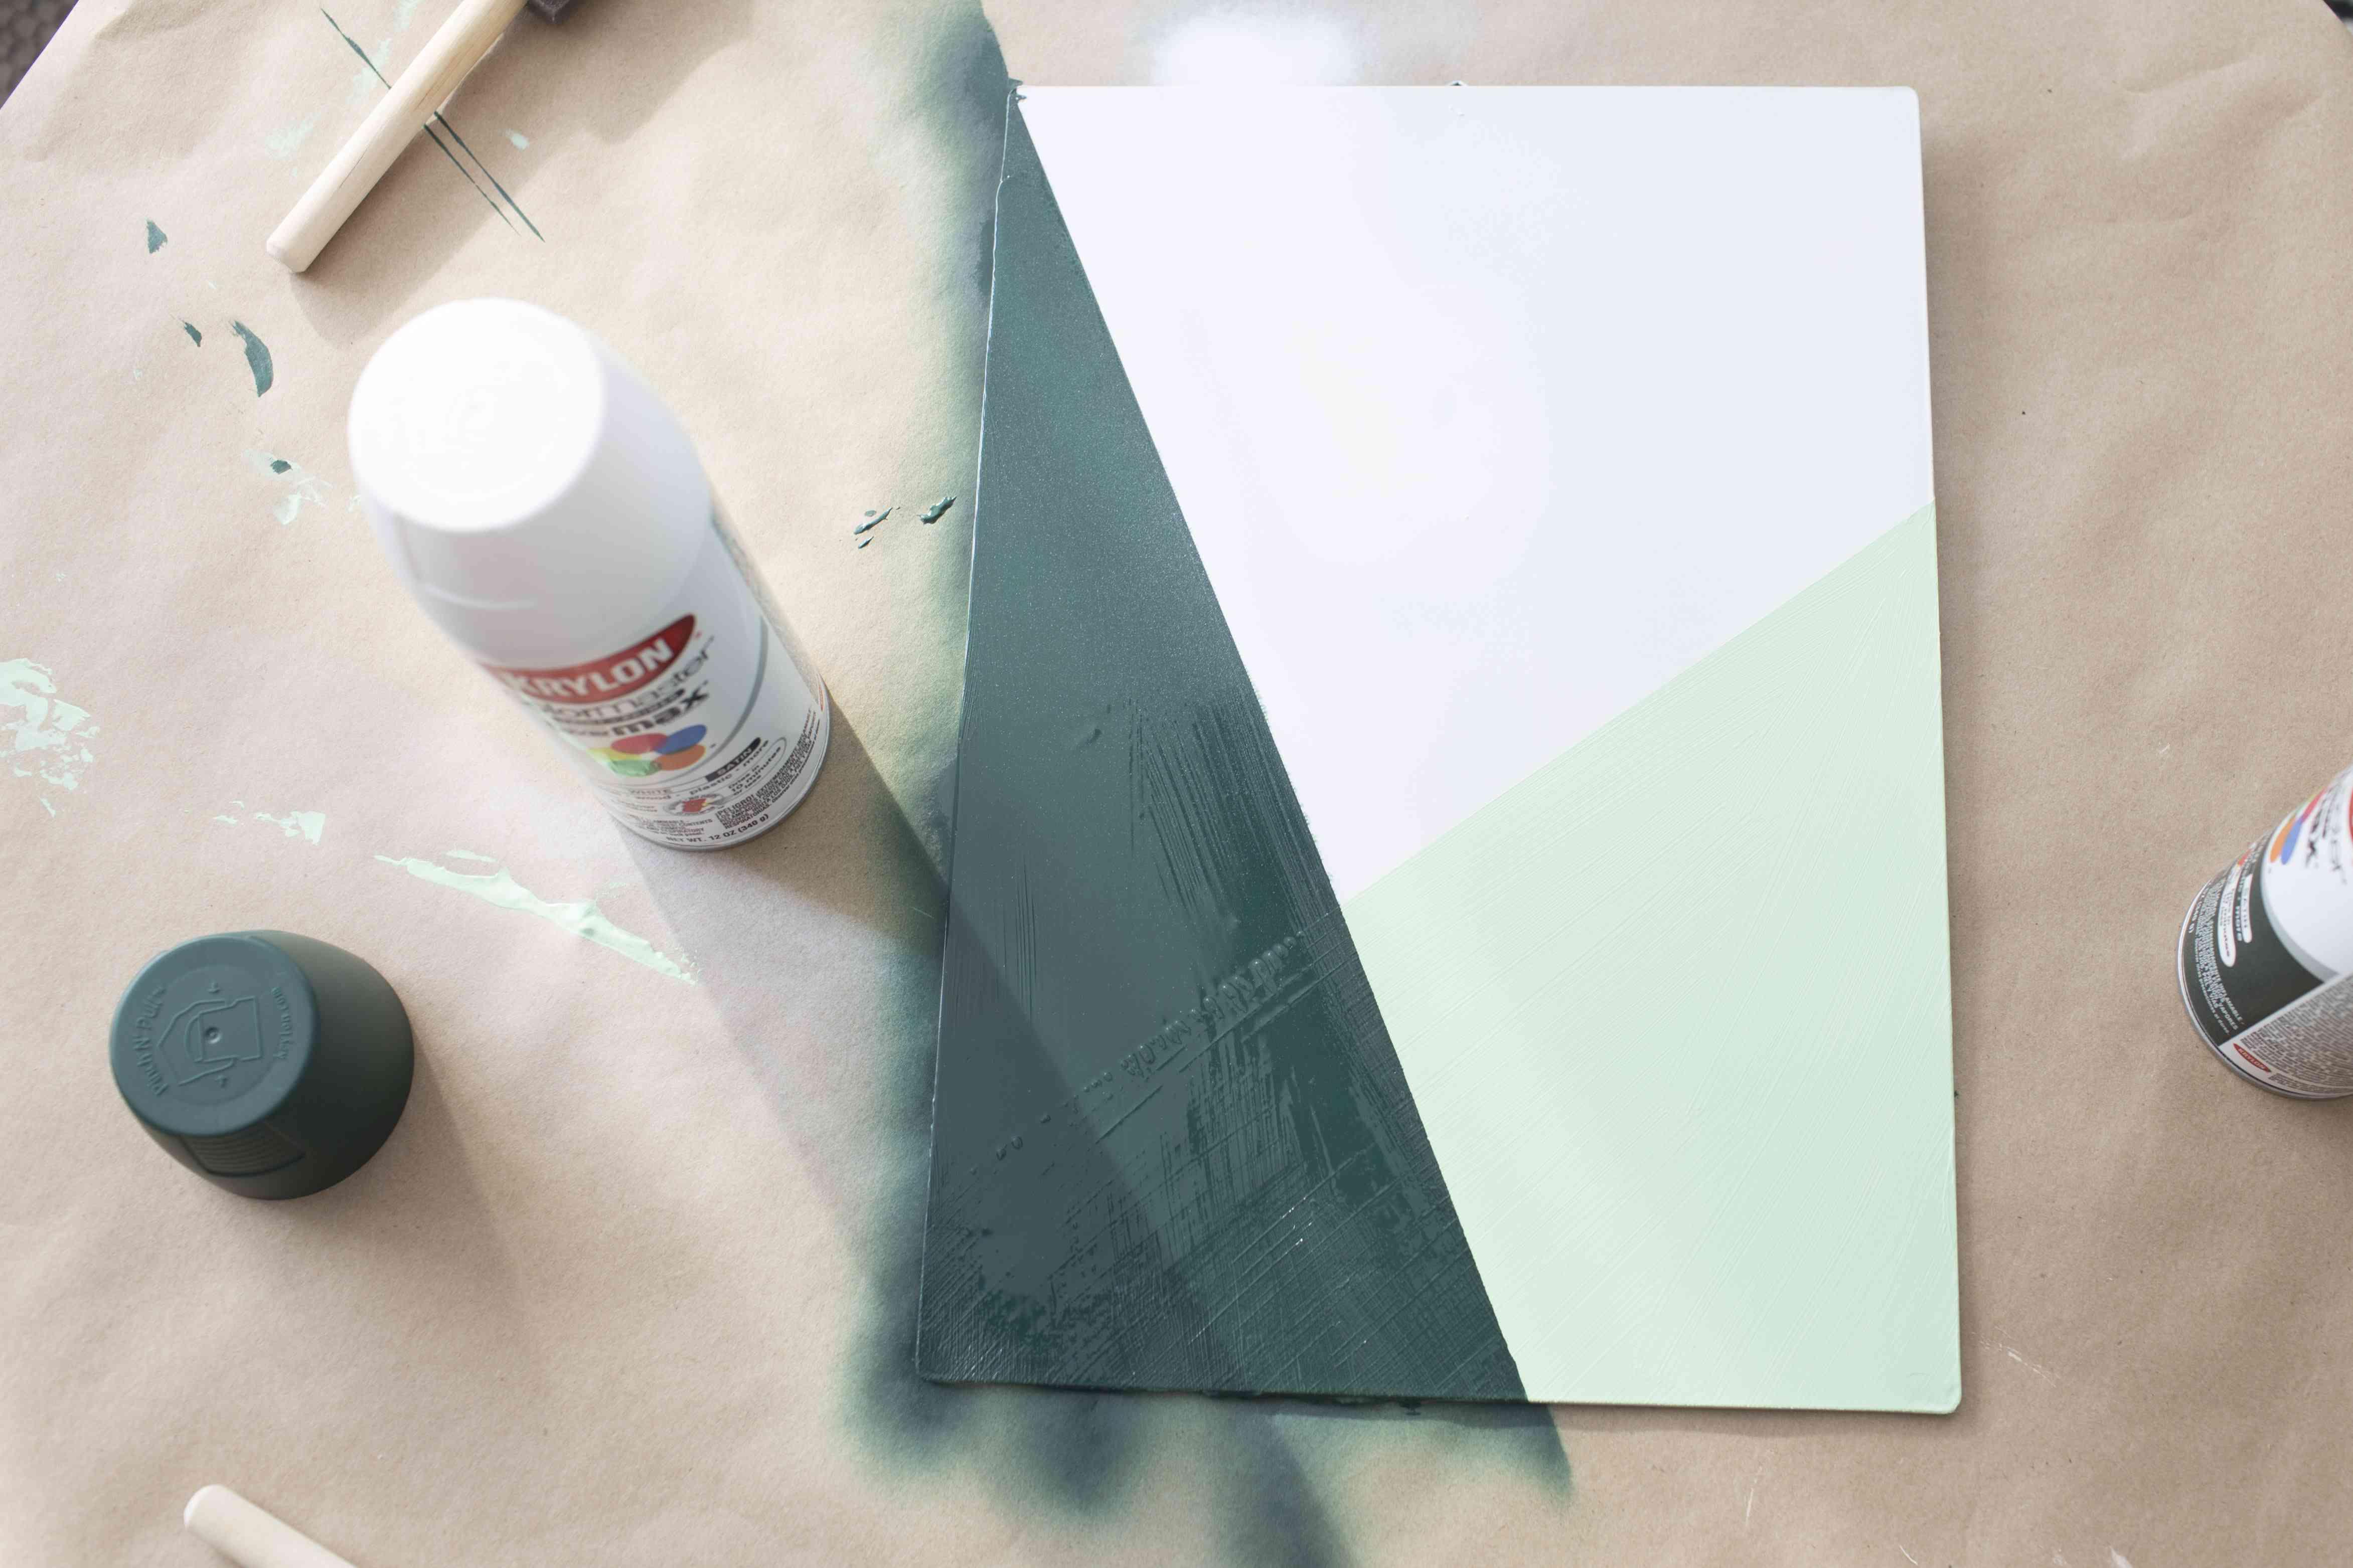 Add dark green paint